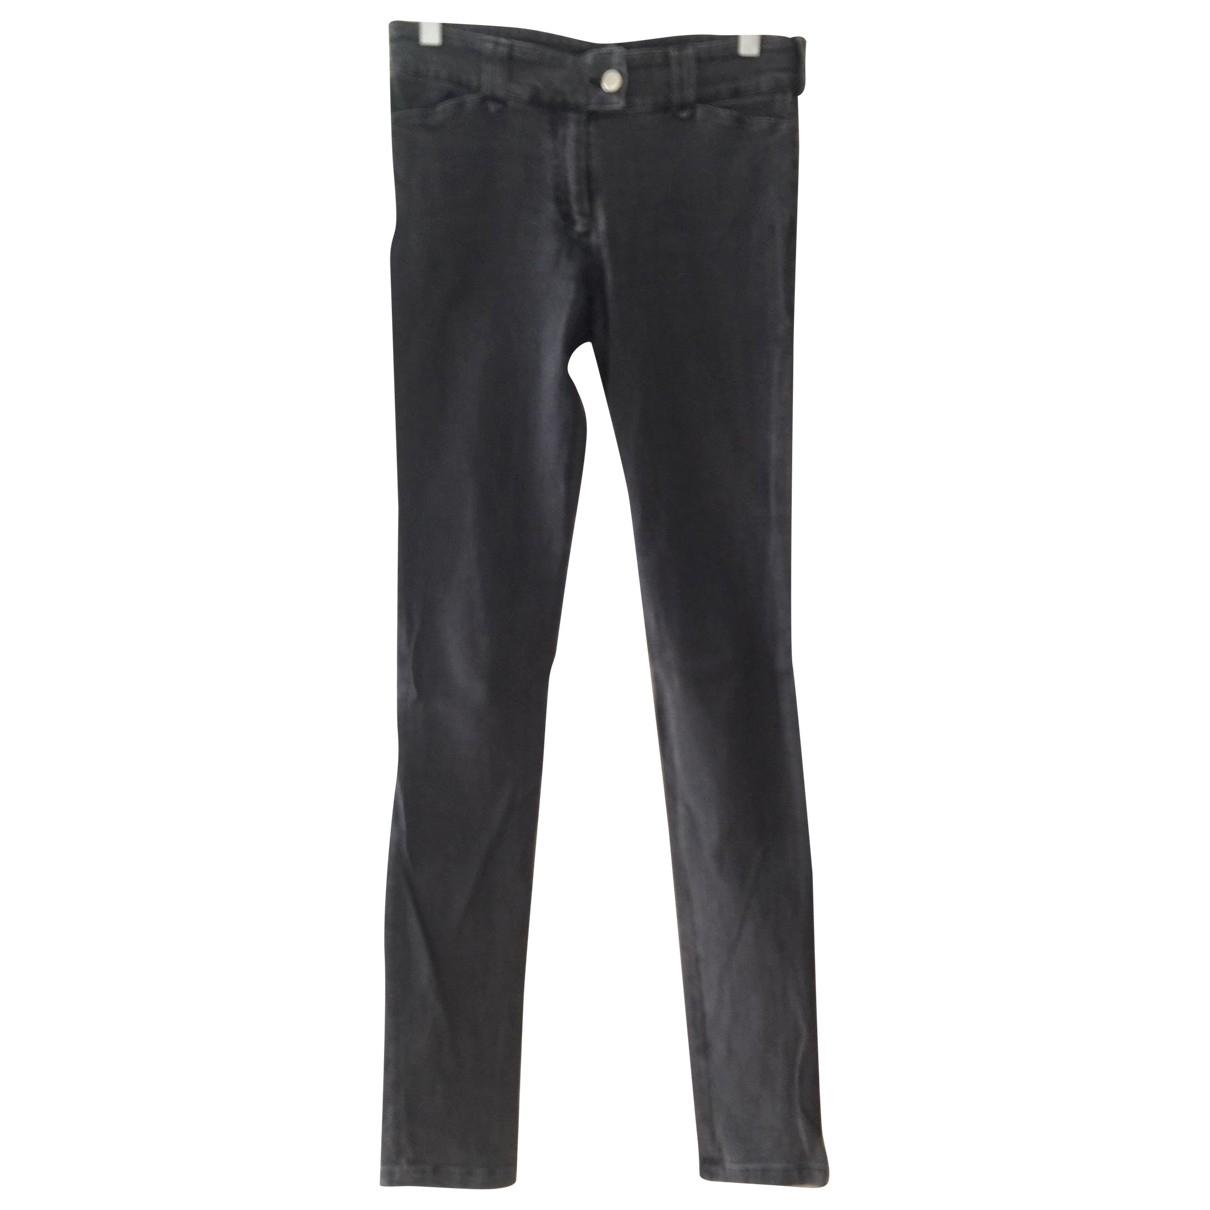 Balenciaga \N Jeans in  Anthrazit Baumwolle - Elasthan